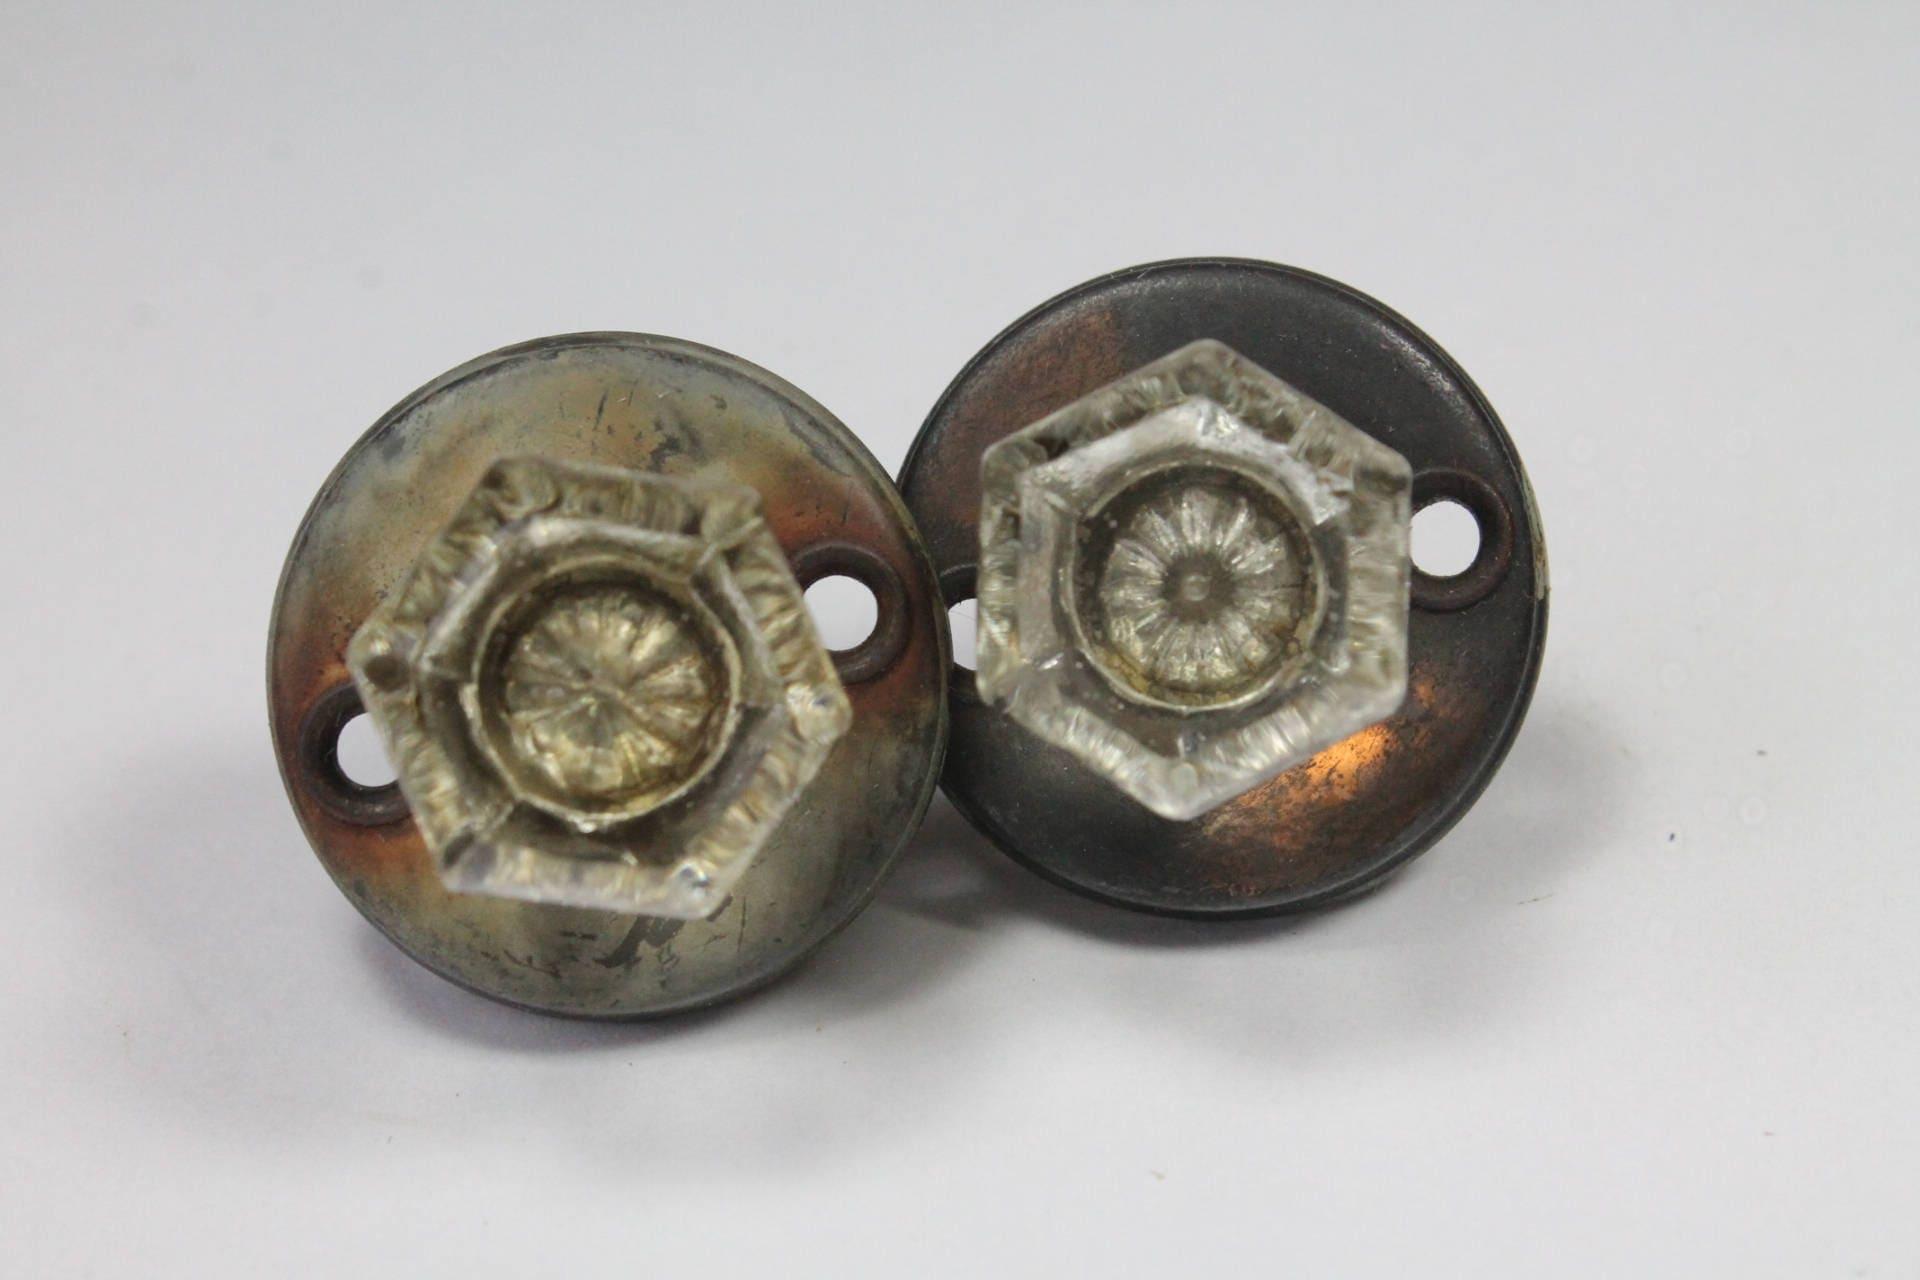 Vintage Cabinet Latches Vintage Frantz Glass Knob Cabinet Latch Set Of 2 Working Spring